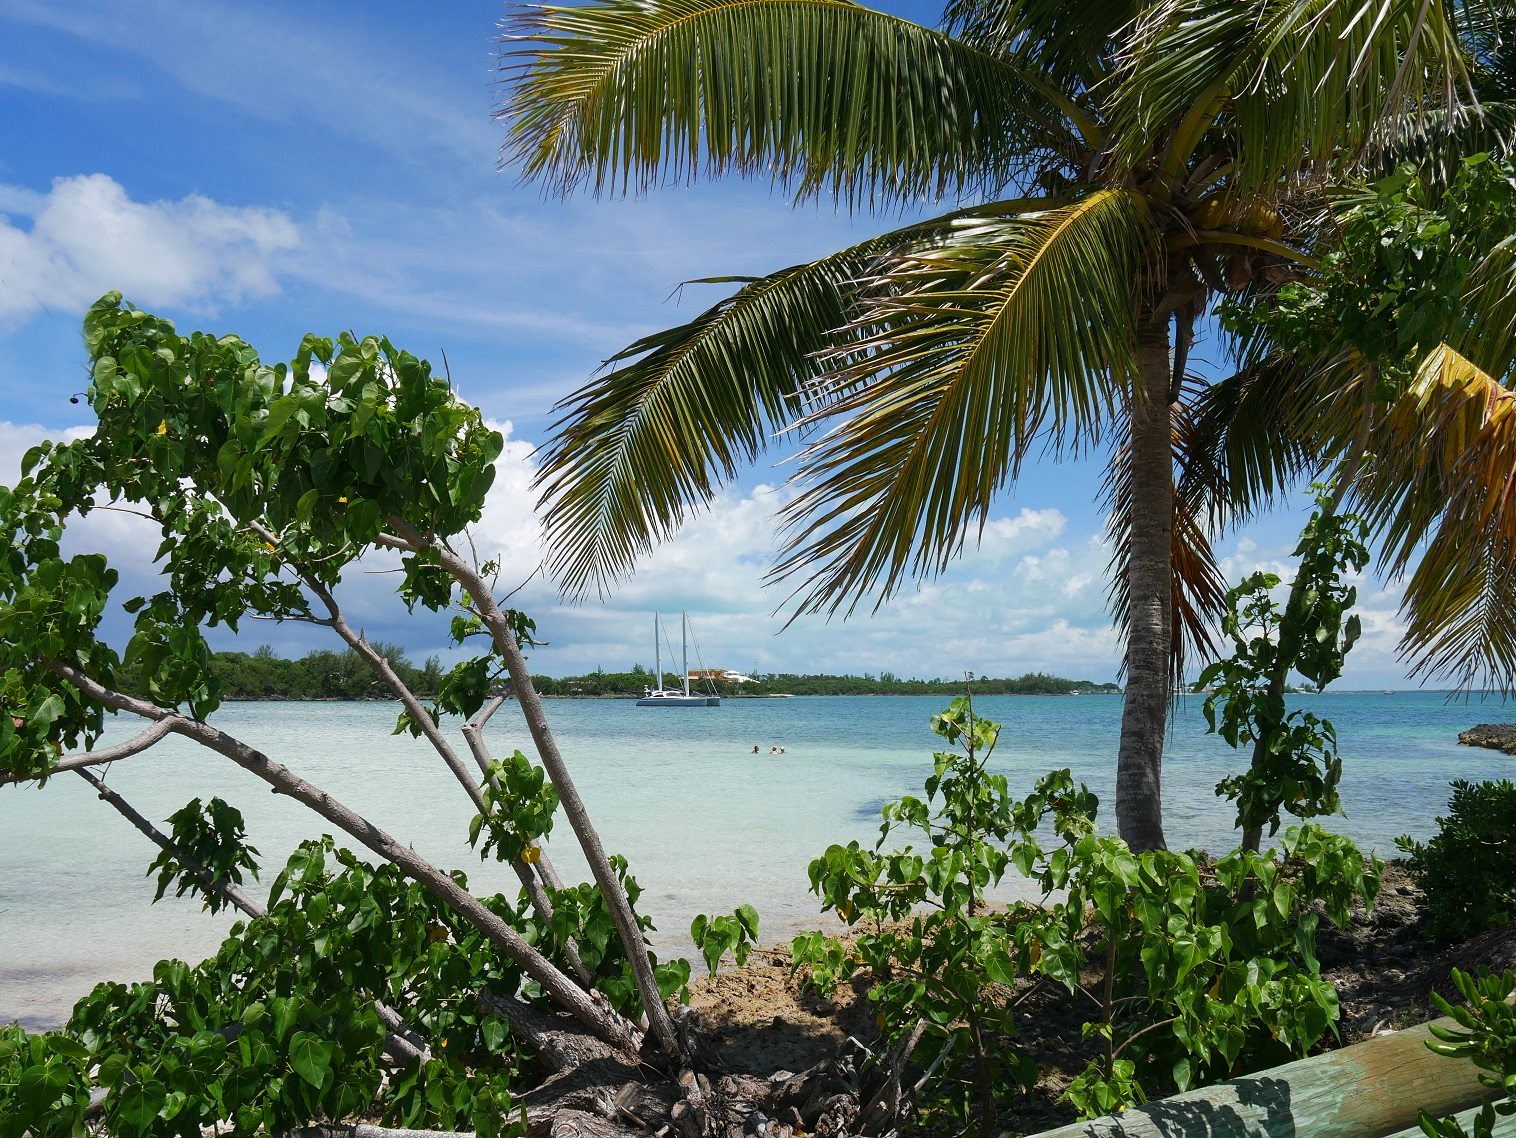 Bluff House Beach, Green Turtle Cay, Abaco, Bahamas